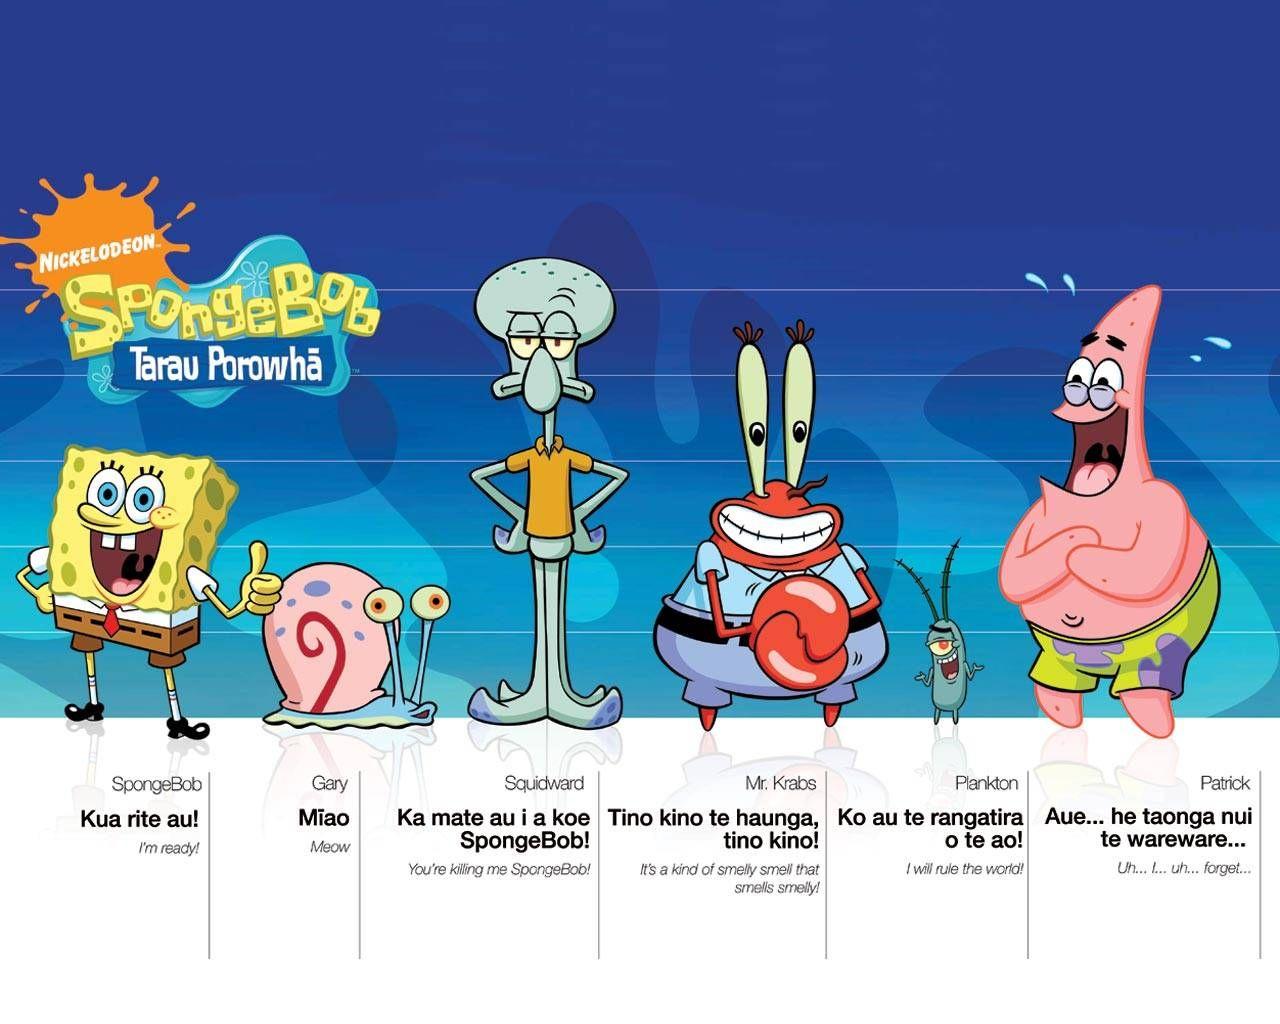 spongebob | 2D Simple | Pinterest | Characters, Squares and 2d